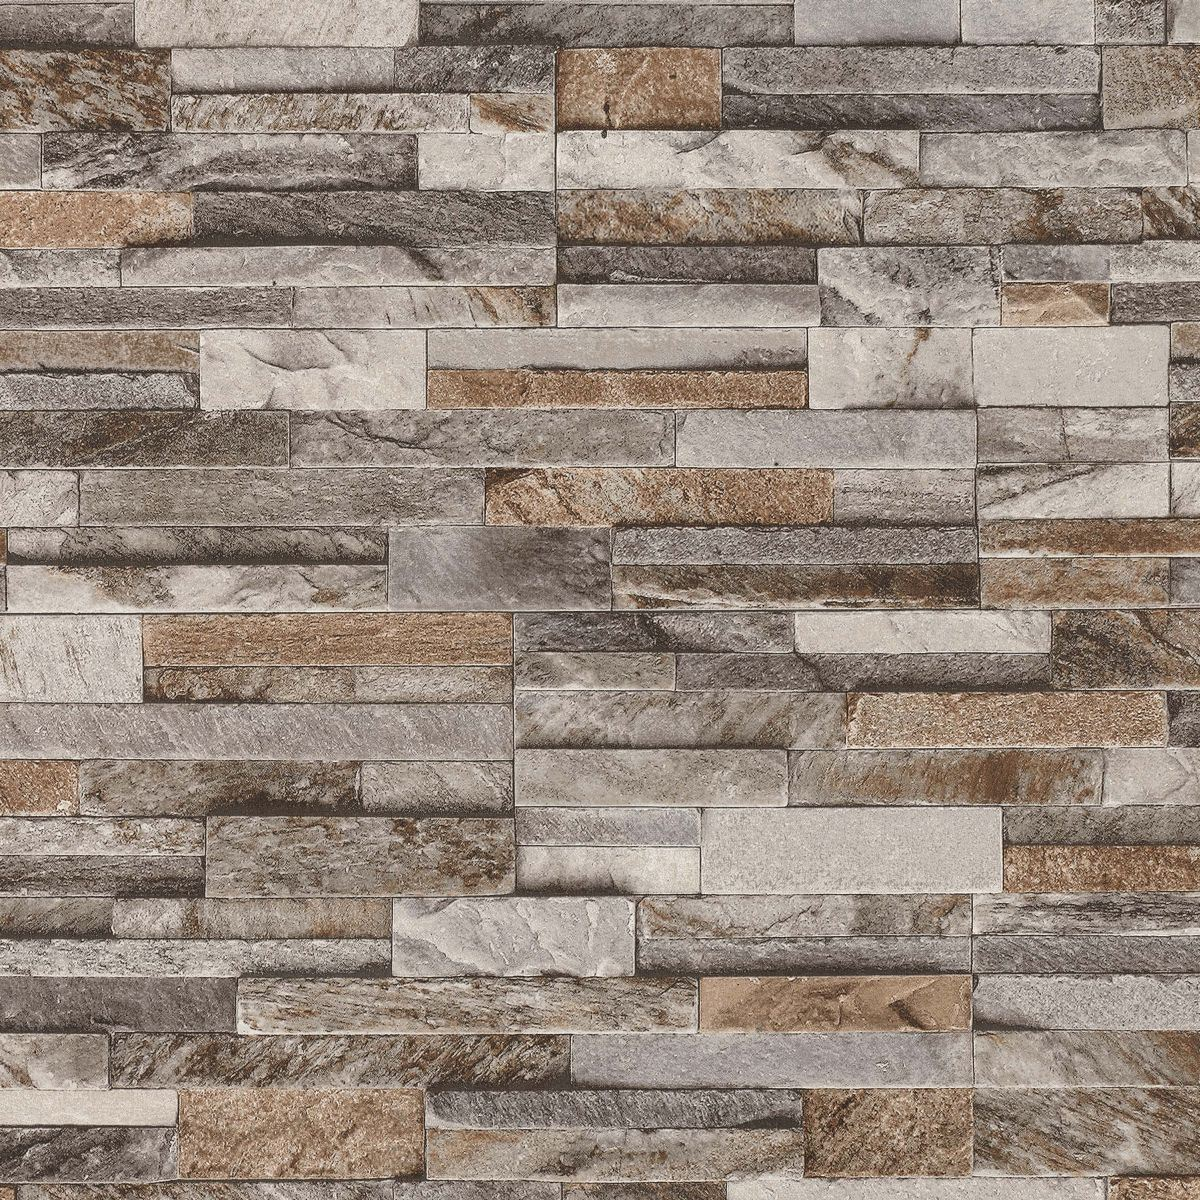 3D Brick Effect Wallpaper Slate Stone Wall Textured Brown ...